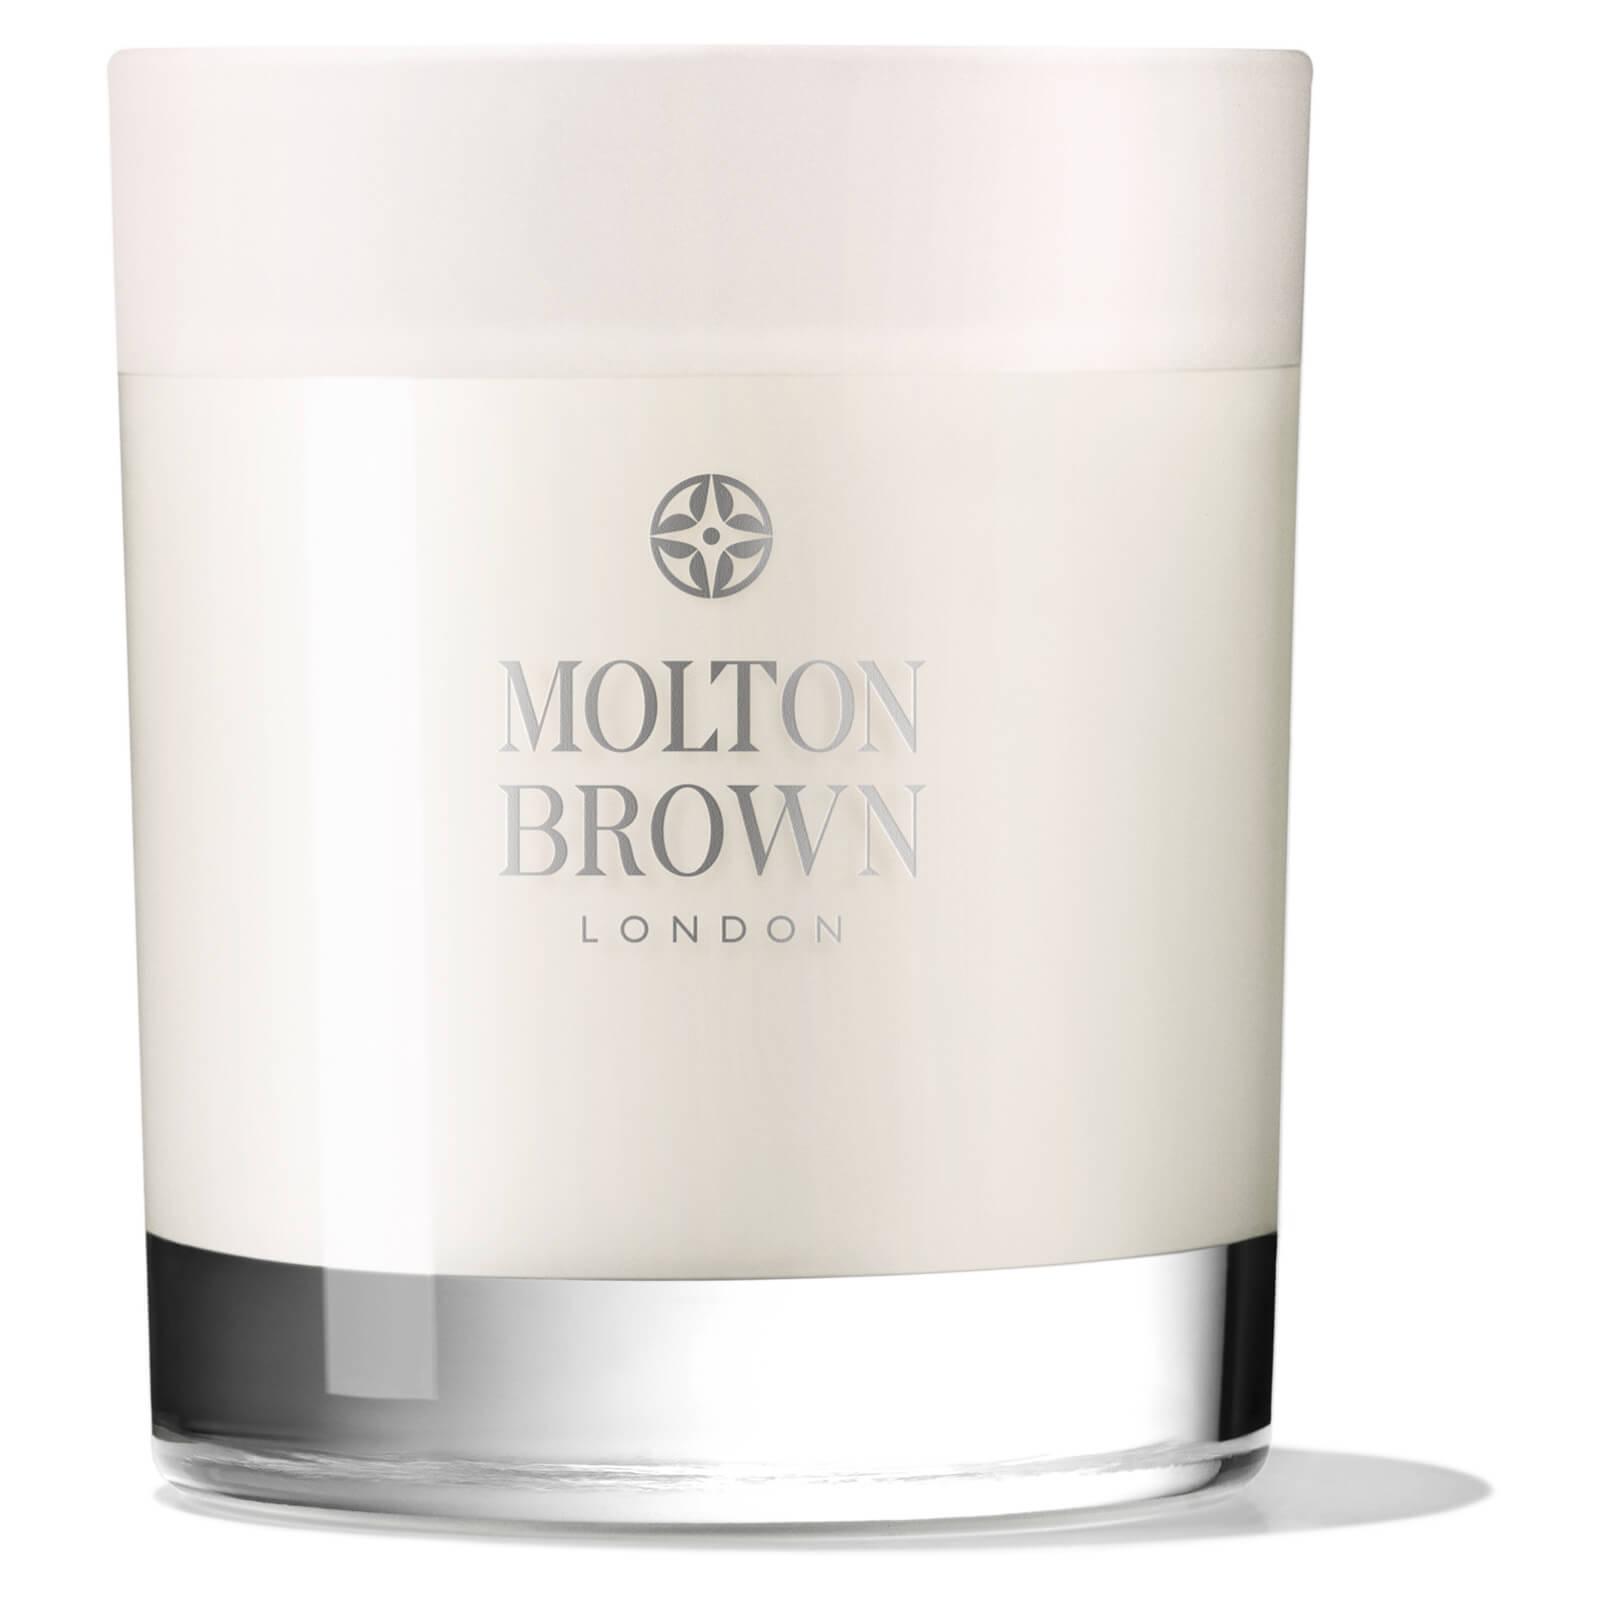 Molton Brown Bougie mèche simple Coco & Sandalwood Molton Brown 180 g